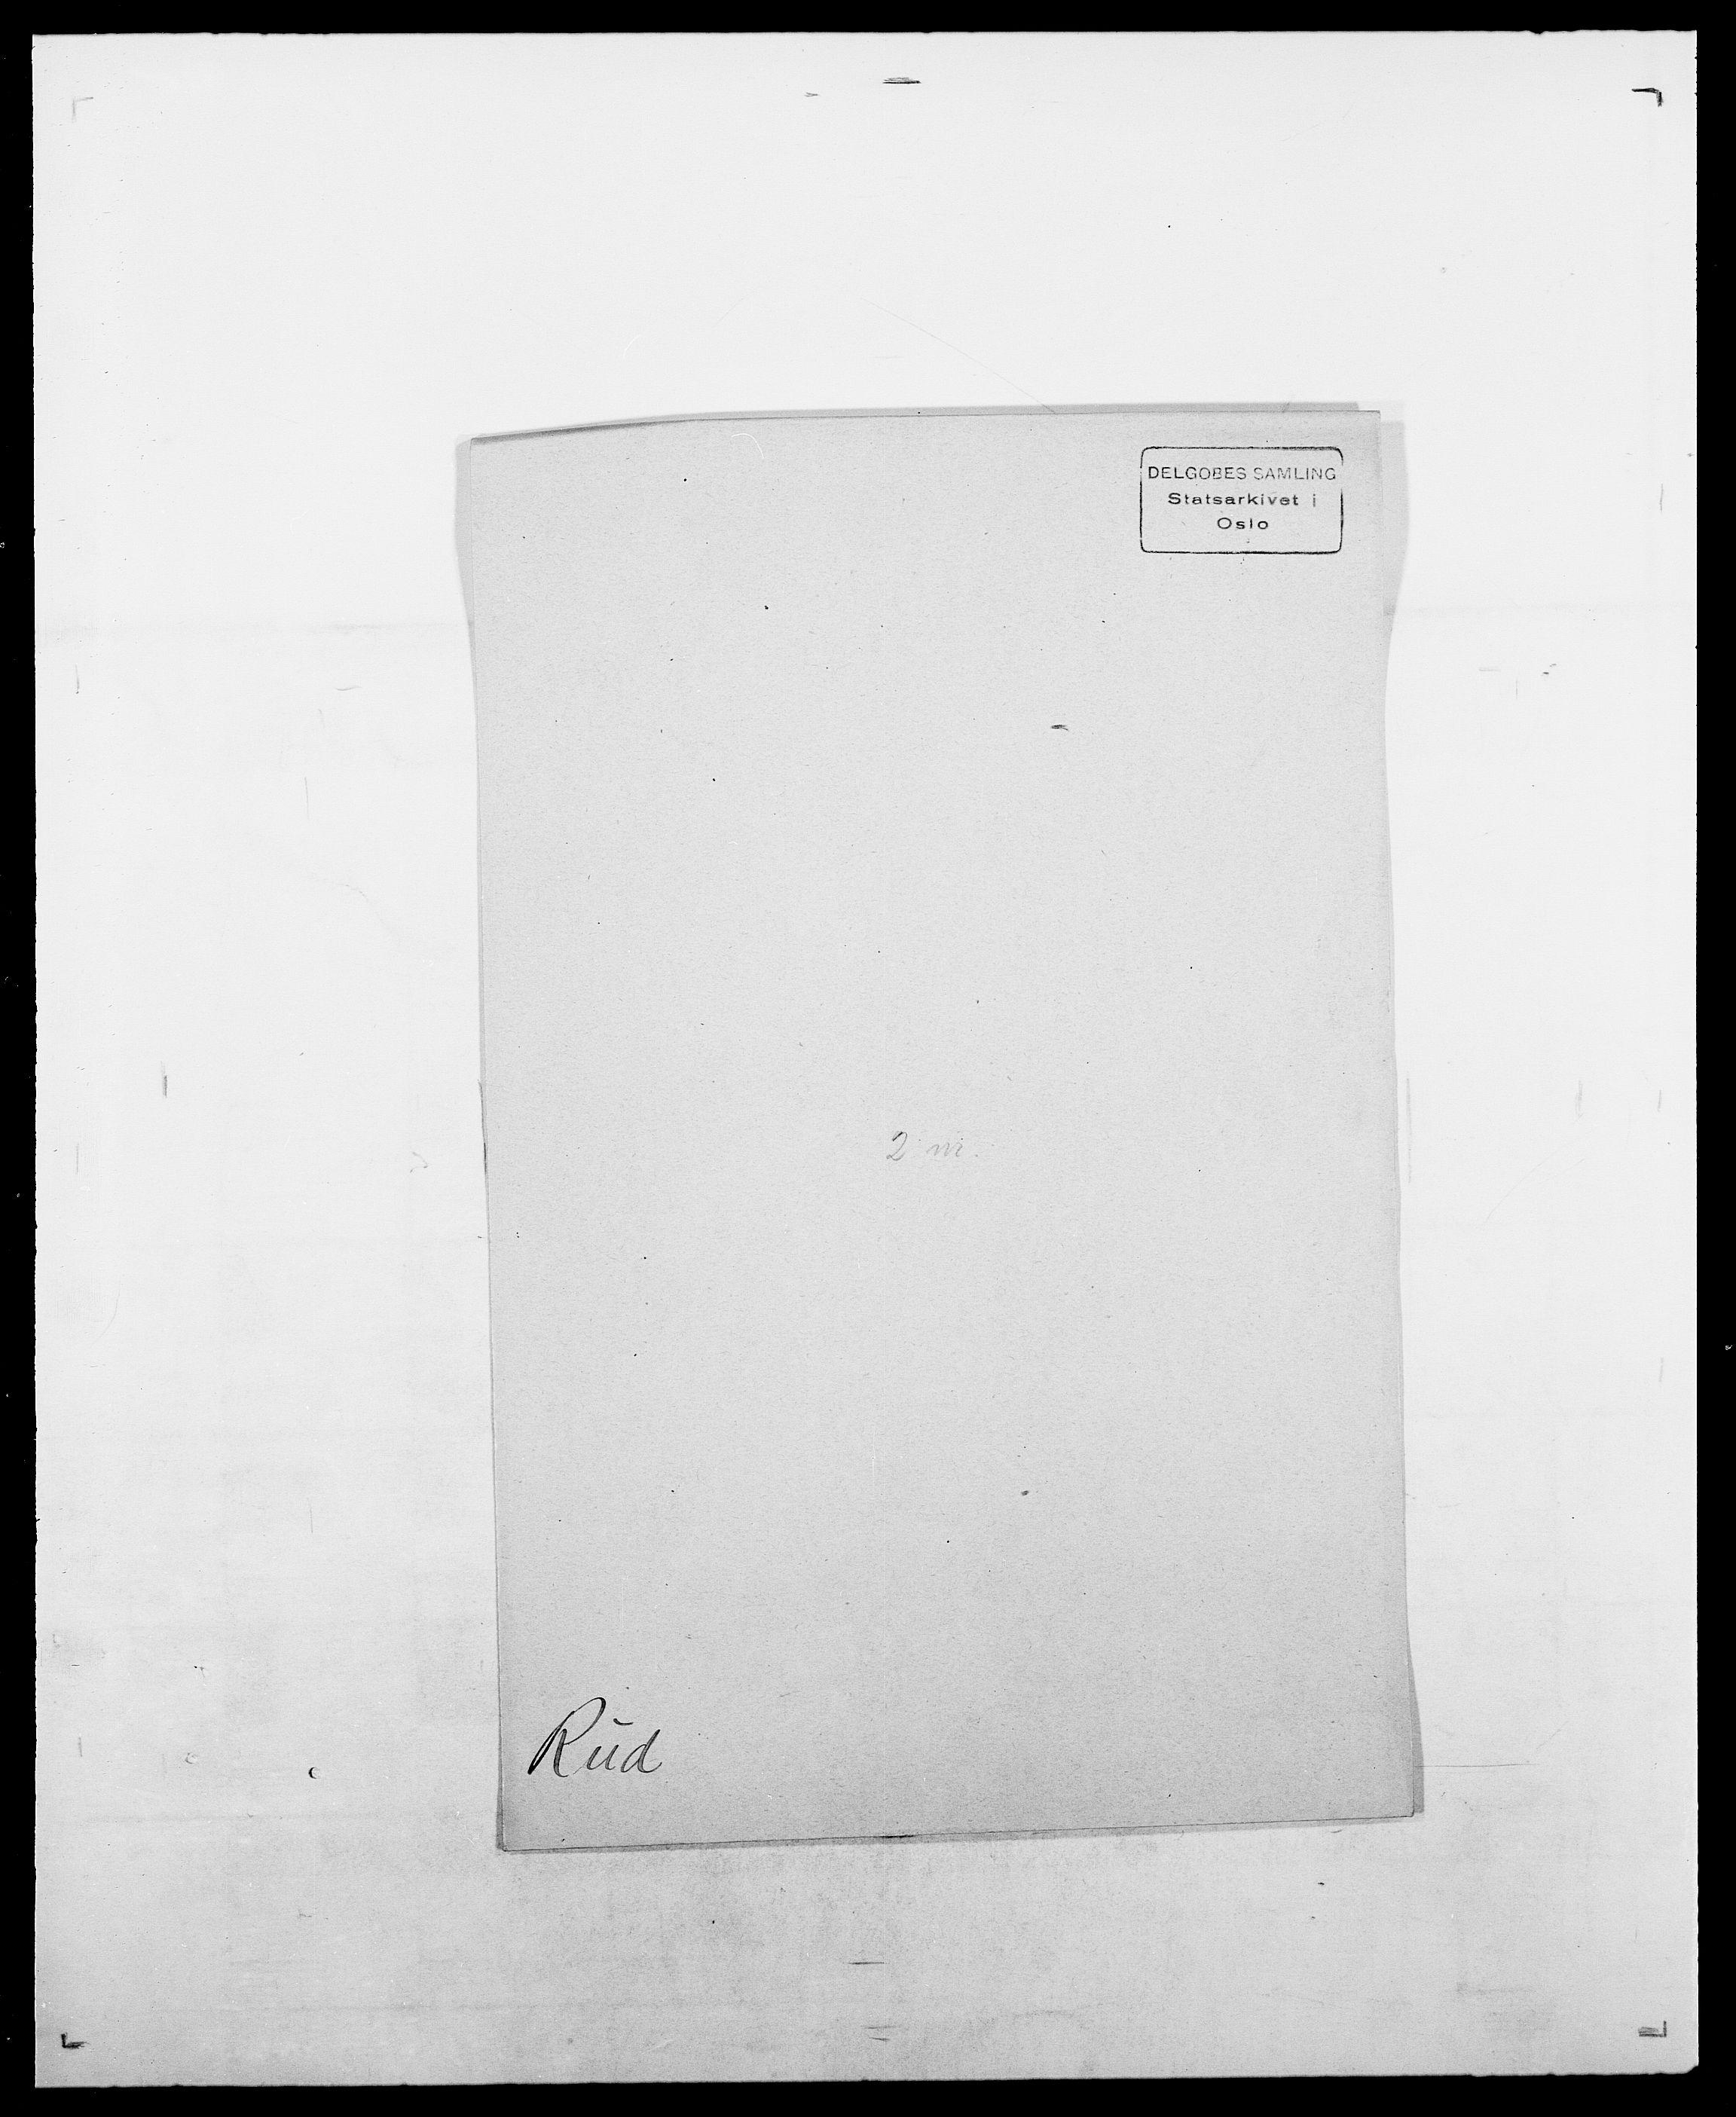 SAO, Delgobe, Charles Antoine - samling, D/Da/L0033: Roald - Røyem, s. 419